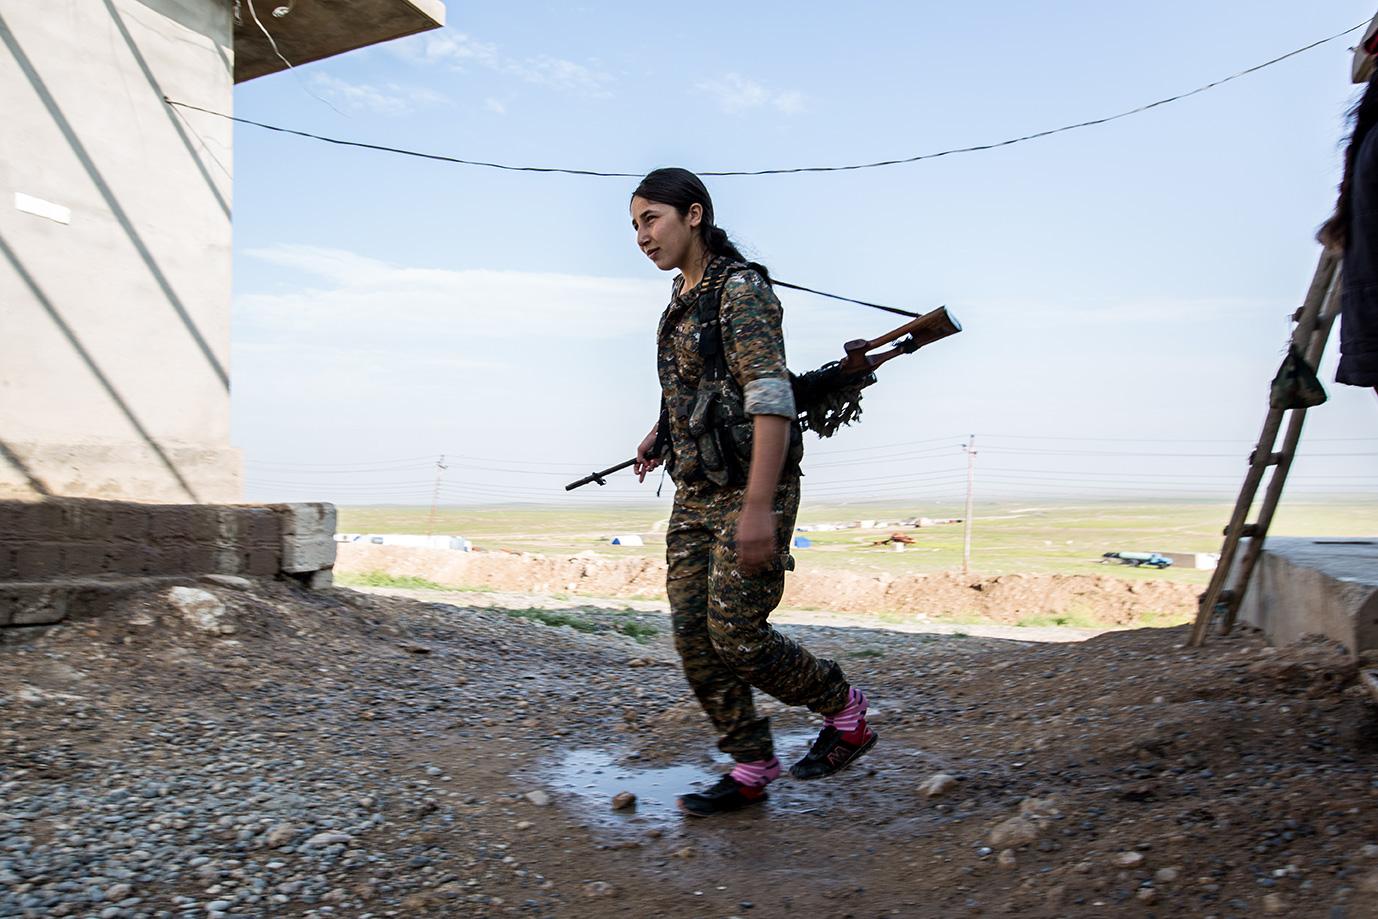 female yesidi fighter sinjar iraq young